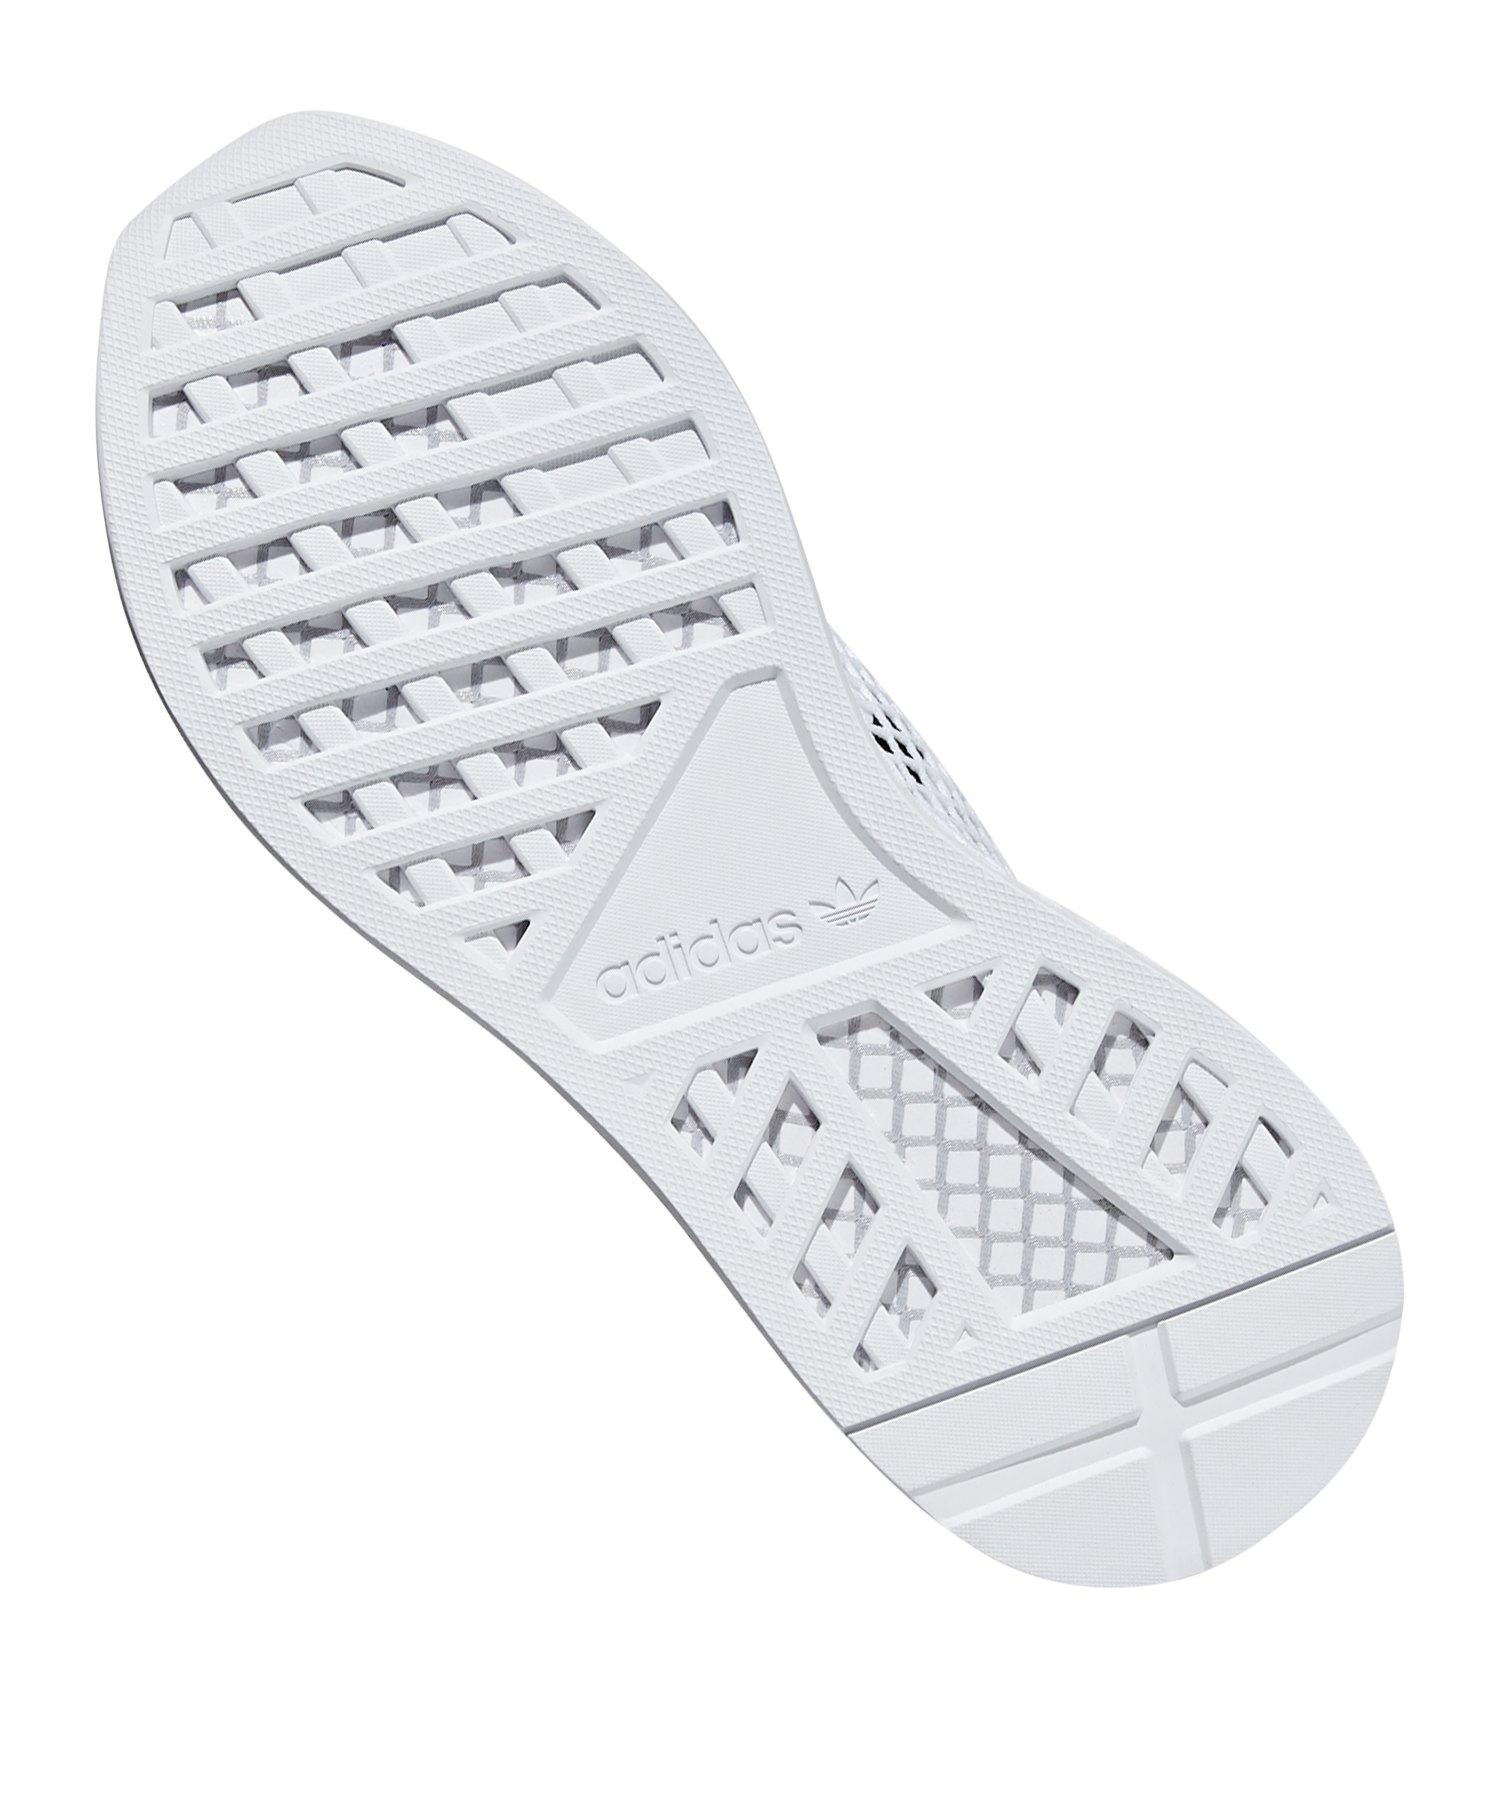 Sneaker Weiss Originals Runner Deerupt Adidas dQxBWrCoe